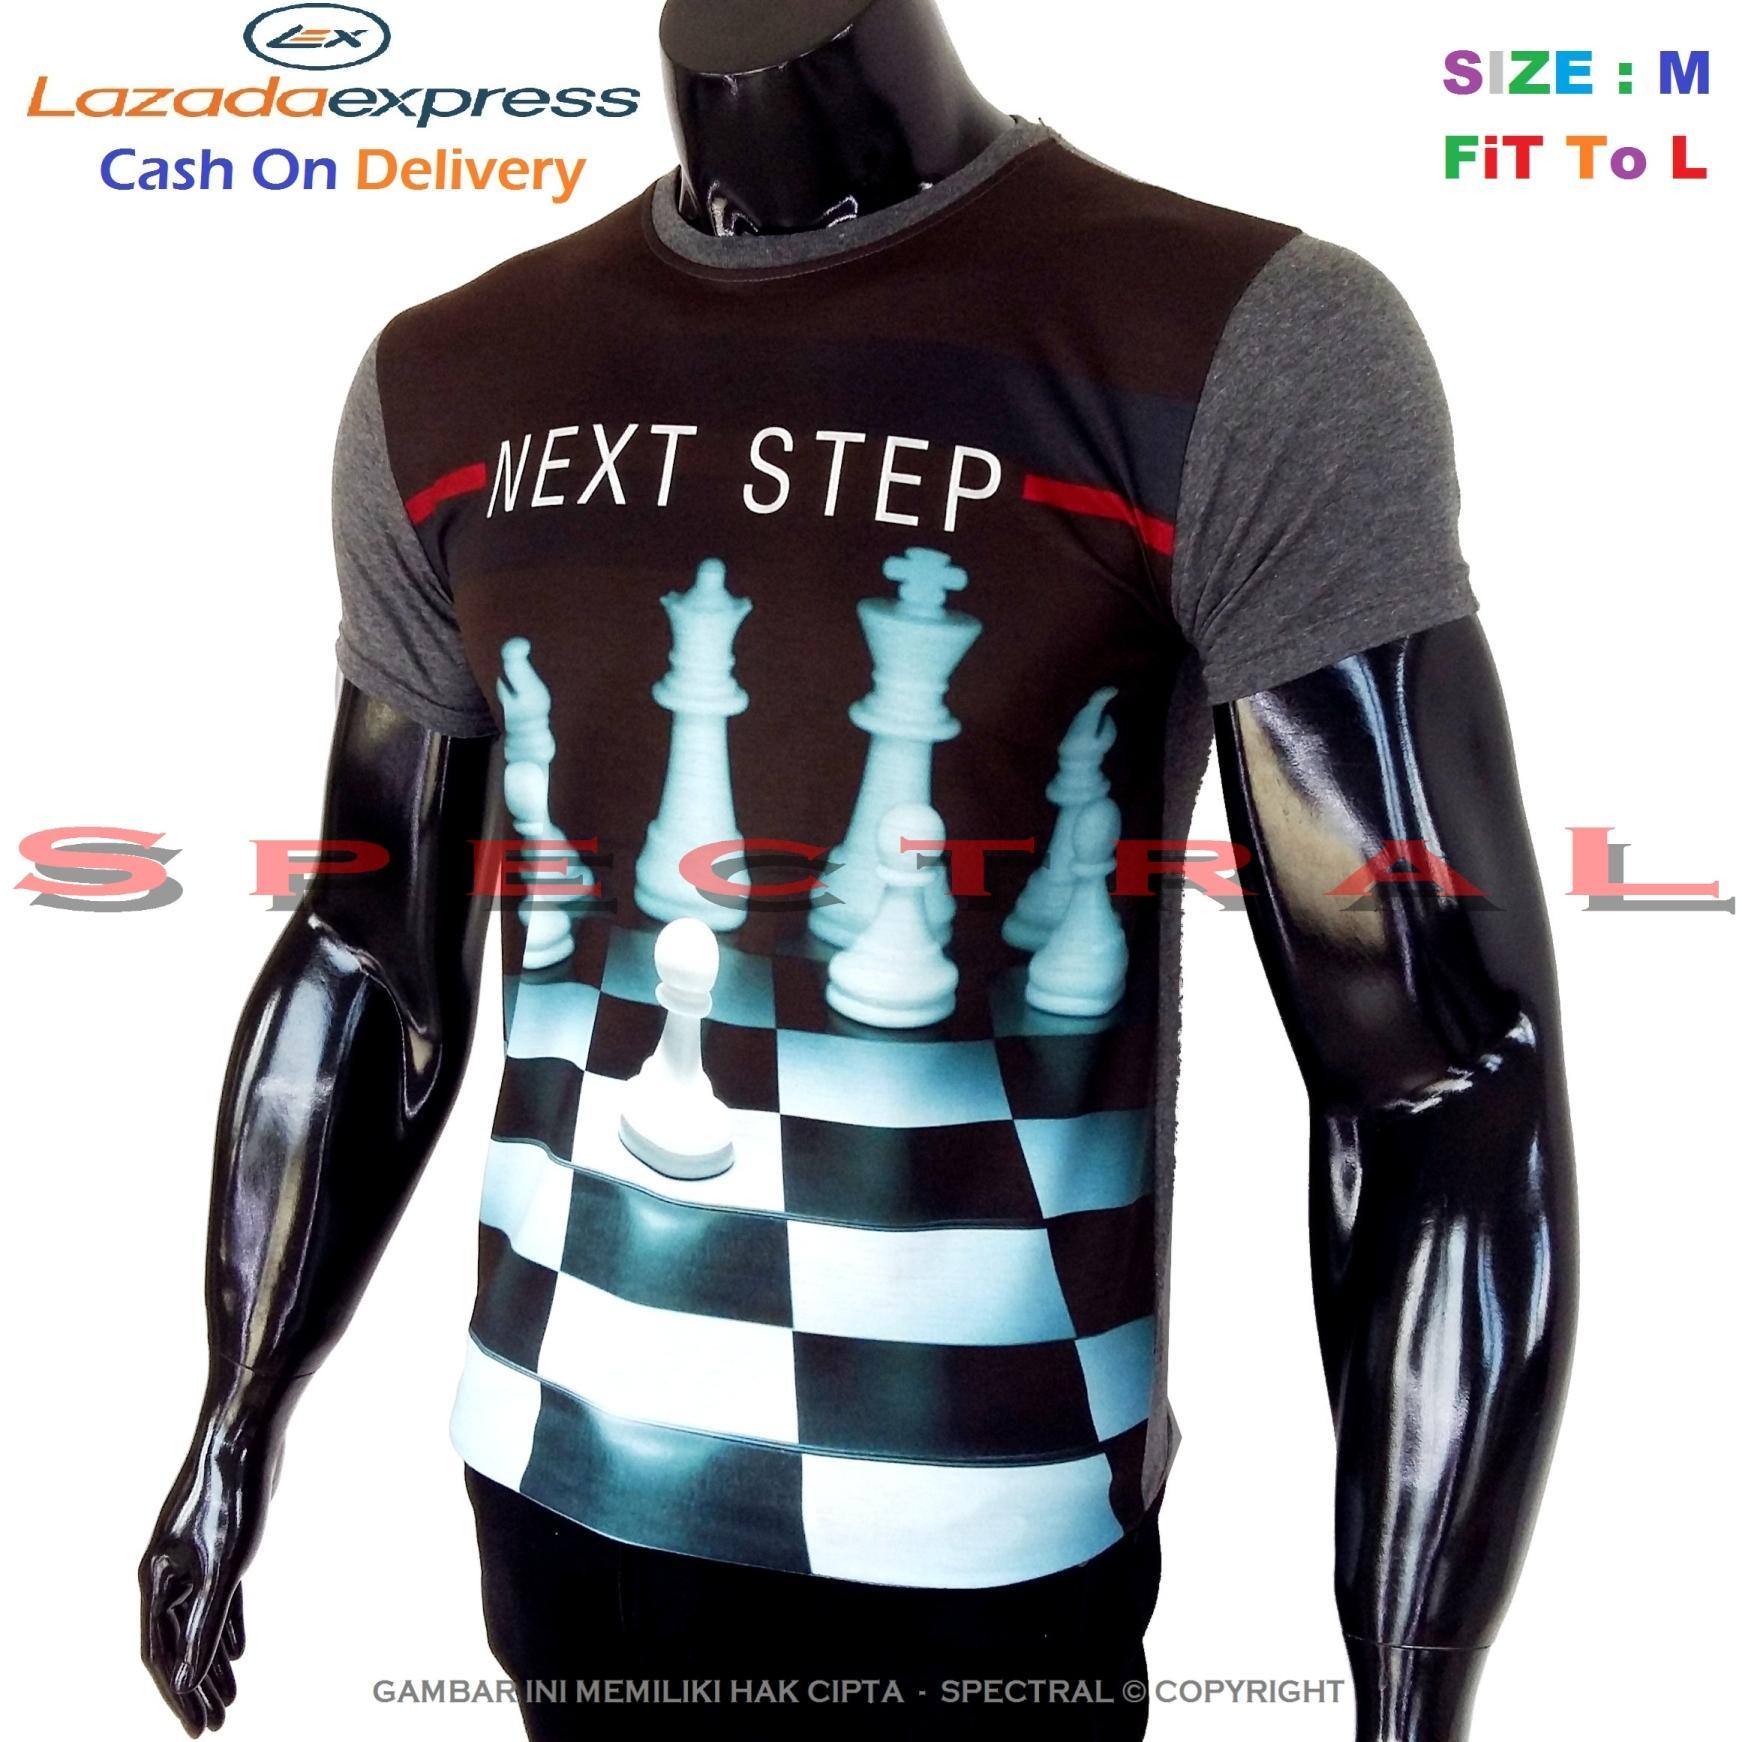 Spectral – 3D CATUR Kualitas HD Printing Size M Fit To L Soft Rayon Viscose Kaos Distro Fashion T-Shirt Atasan Baju Pakaian Polos Pria Wanita Cewe Cowo Lengan Murah Bagus Keren Jaman Kekinian Jakarta Bandung Gambar Otak Skak Olahraga Chess Pintar Strategi